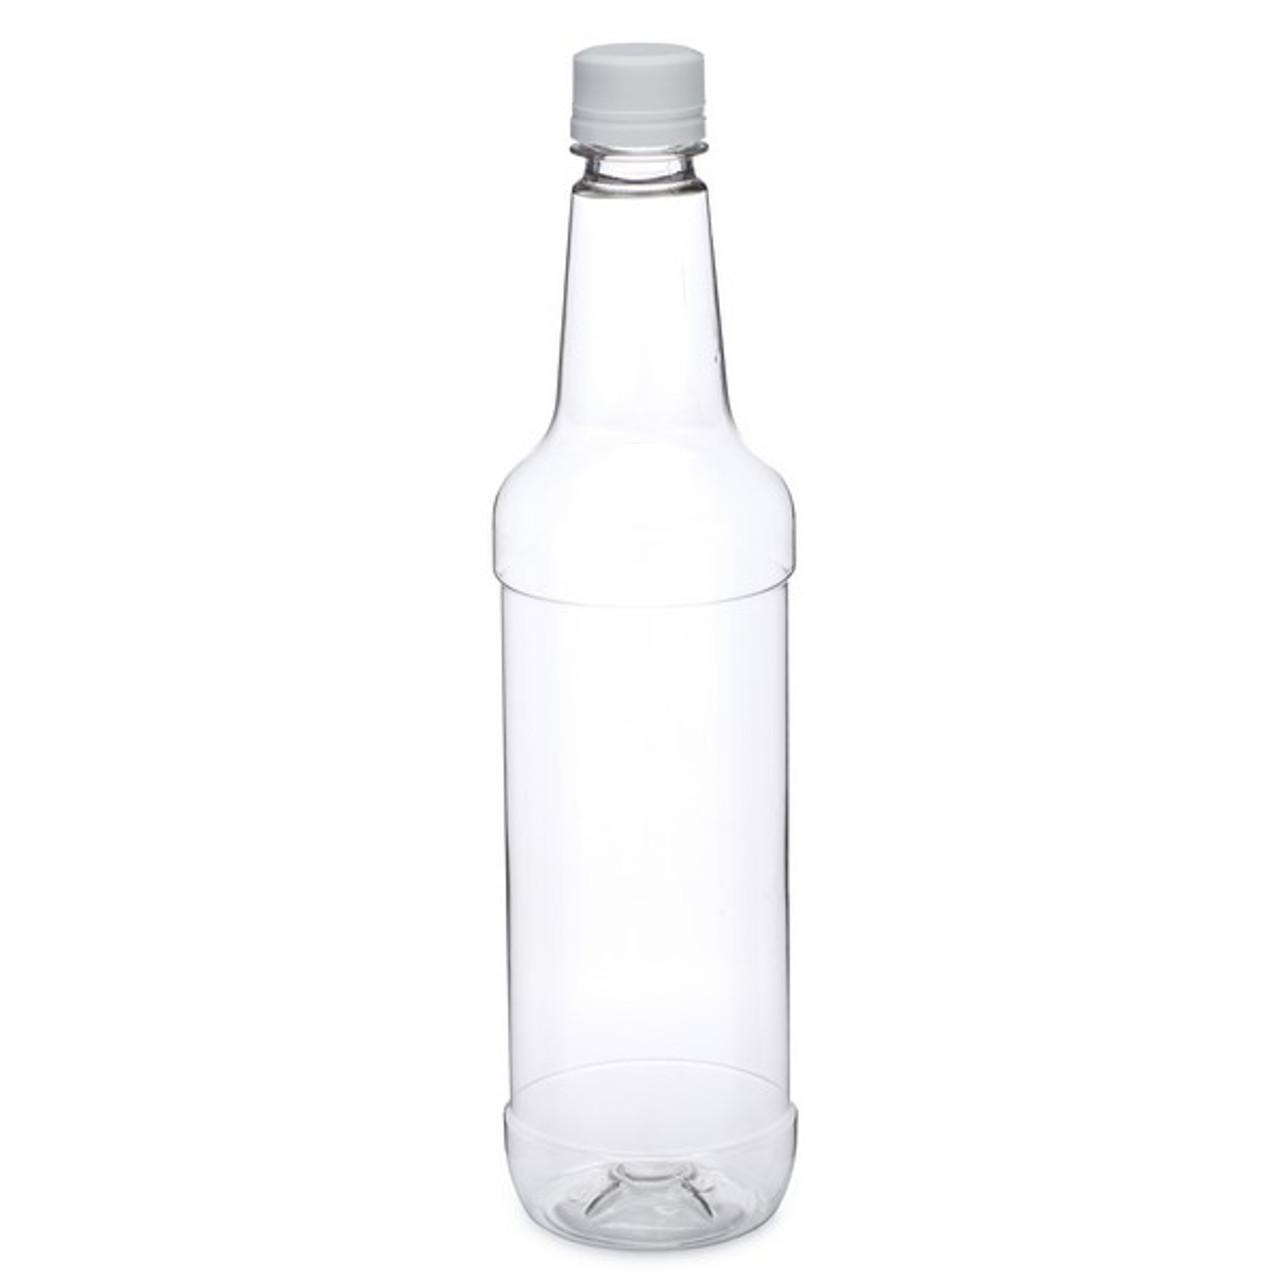 65403a5cf3ca 750 ml Clear PET Plastic Liquor Bottles (White Tamper-Evident Cap) - 7100B05